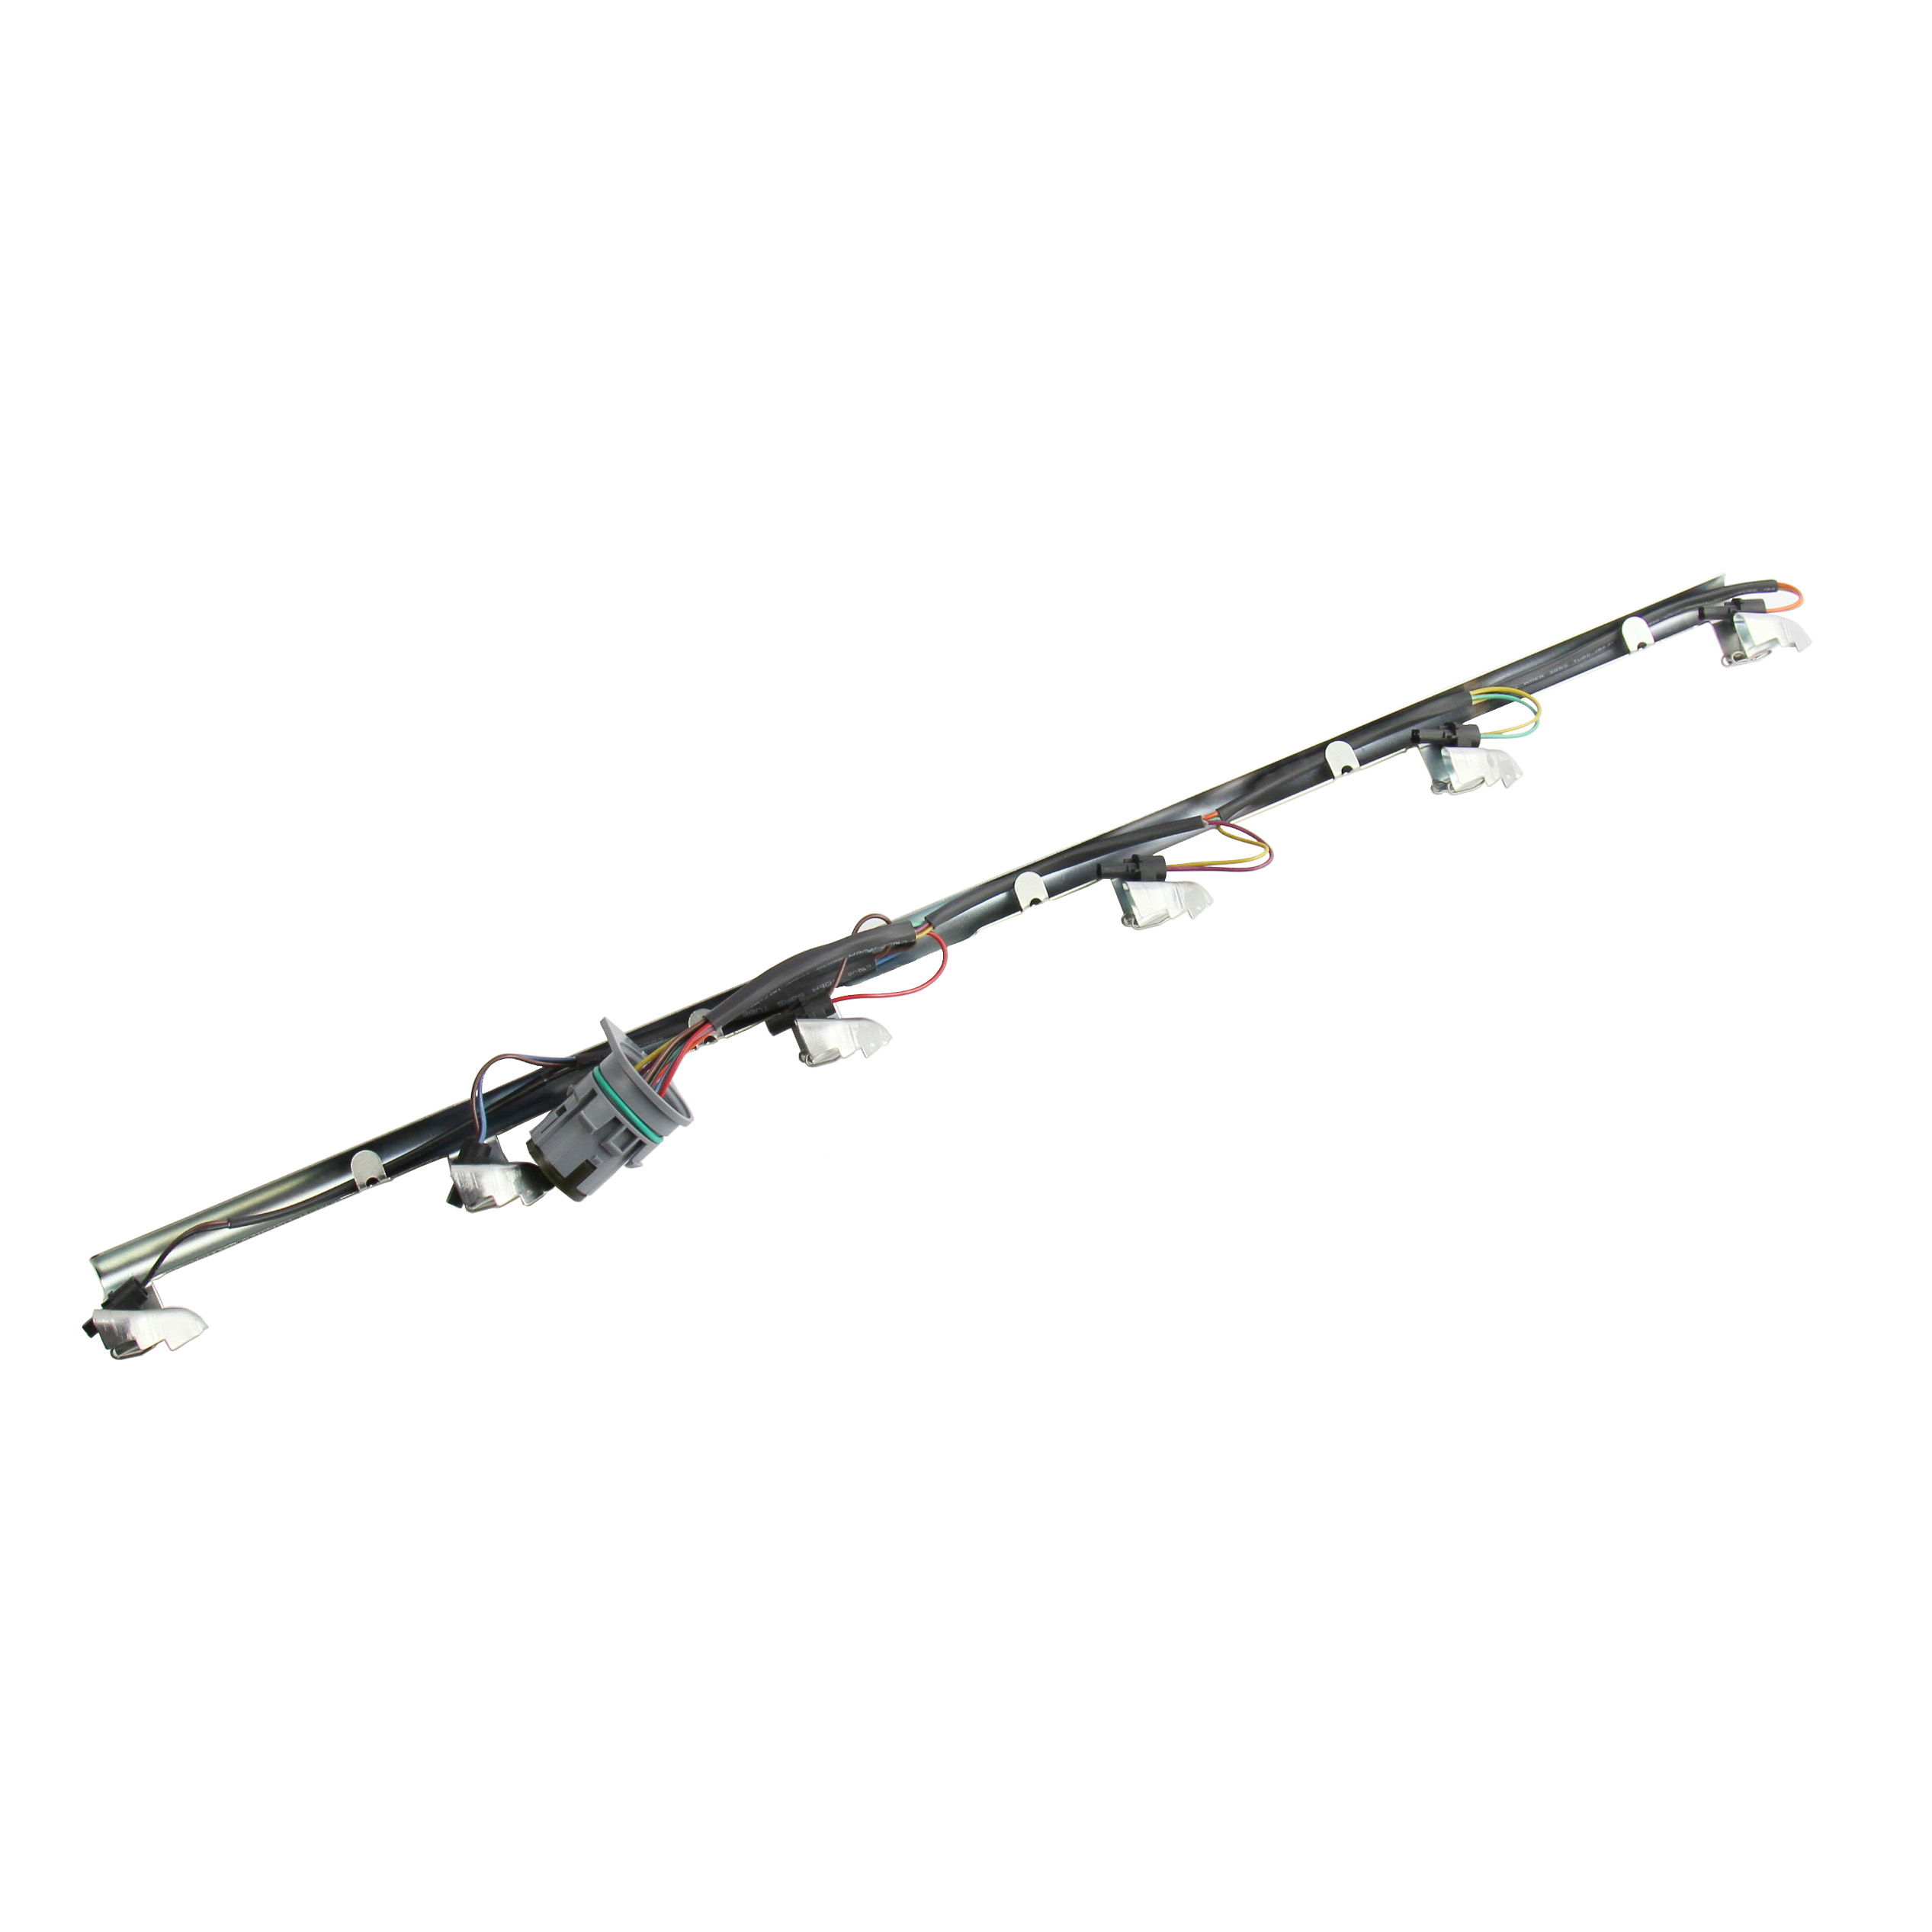 5db893086a8ae499 new injector harness fits navistar international dt466 dt530 dt466e